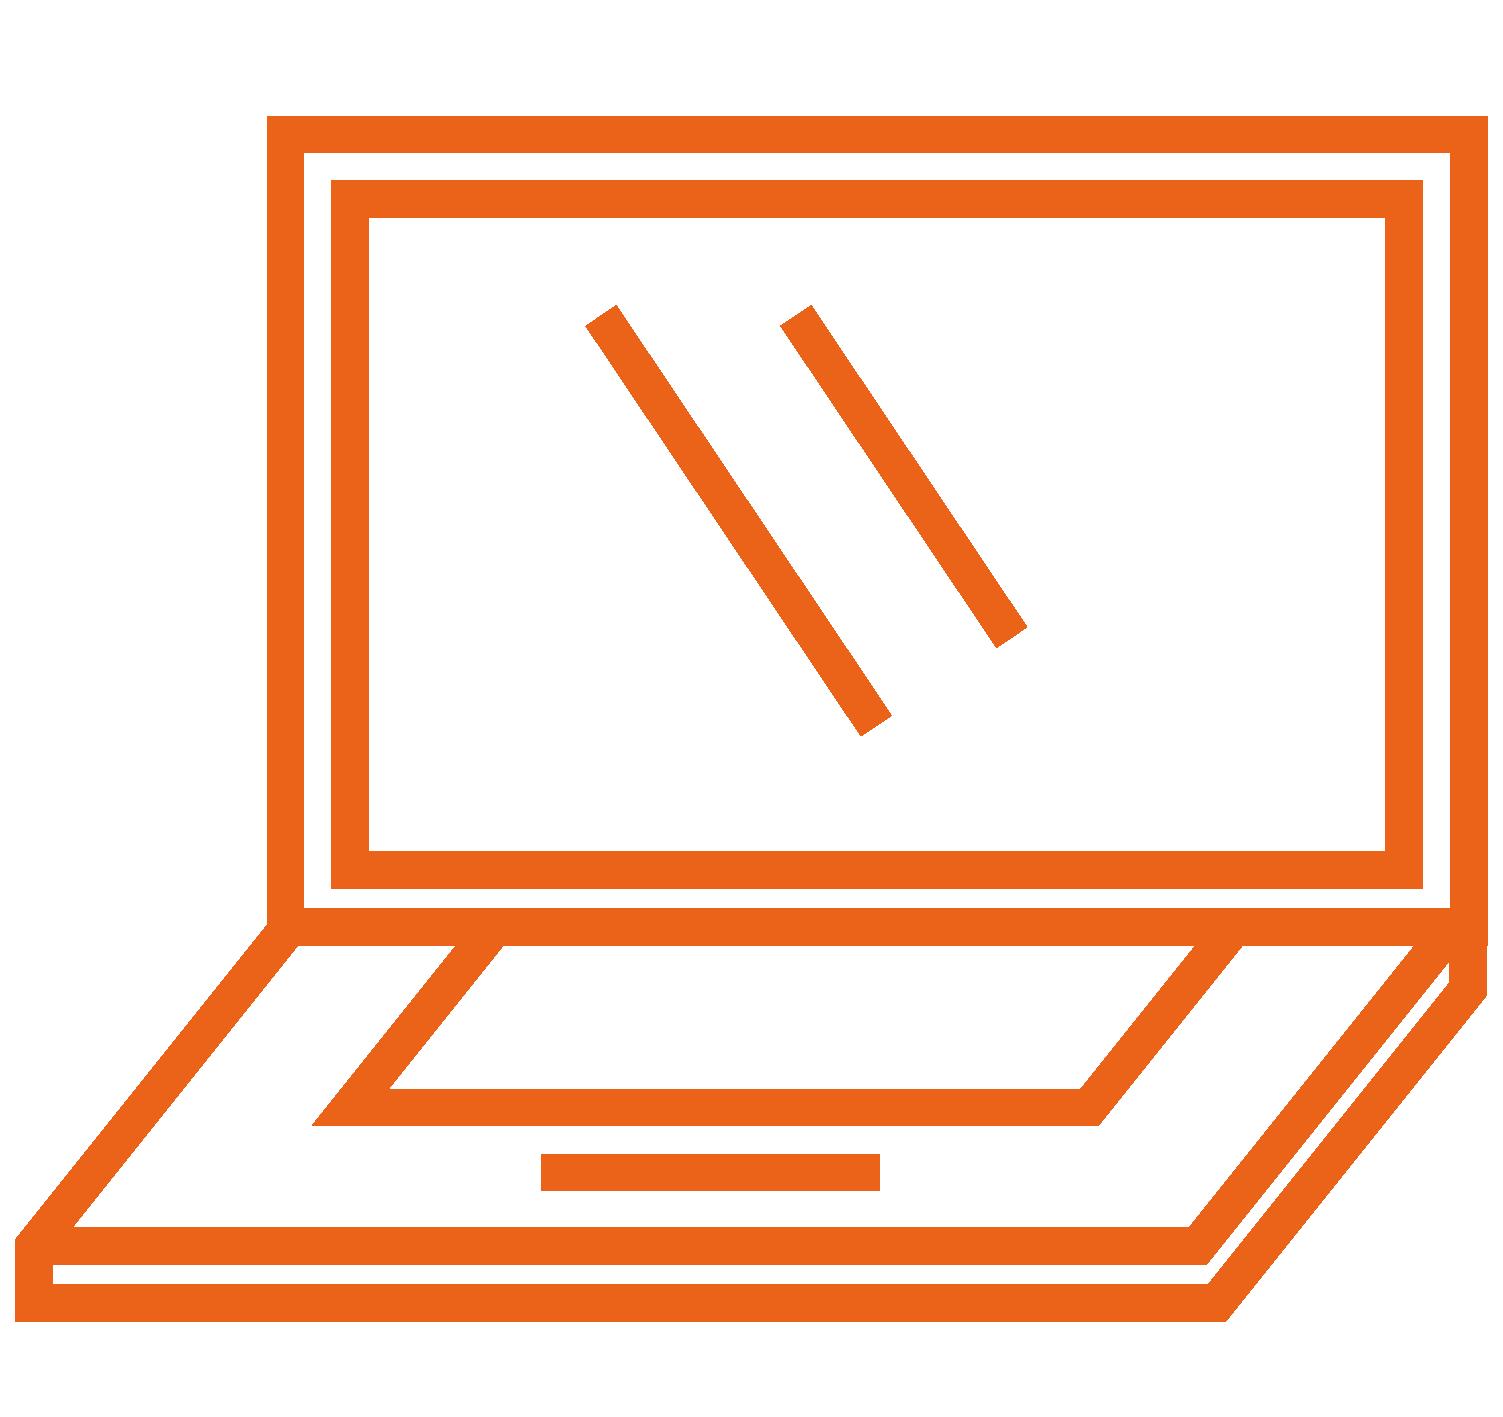 210830_Icons_laptop